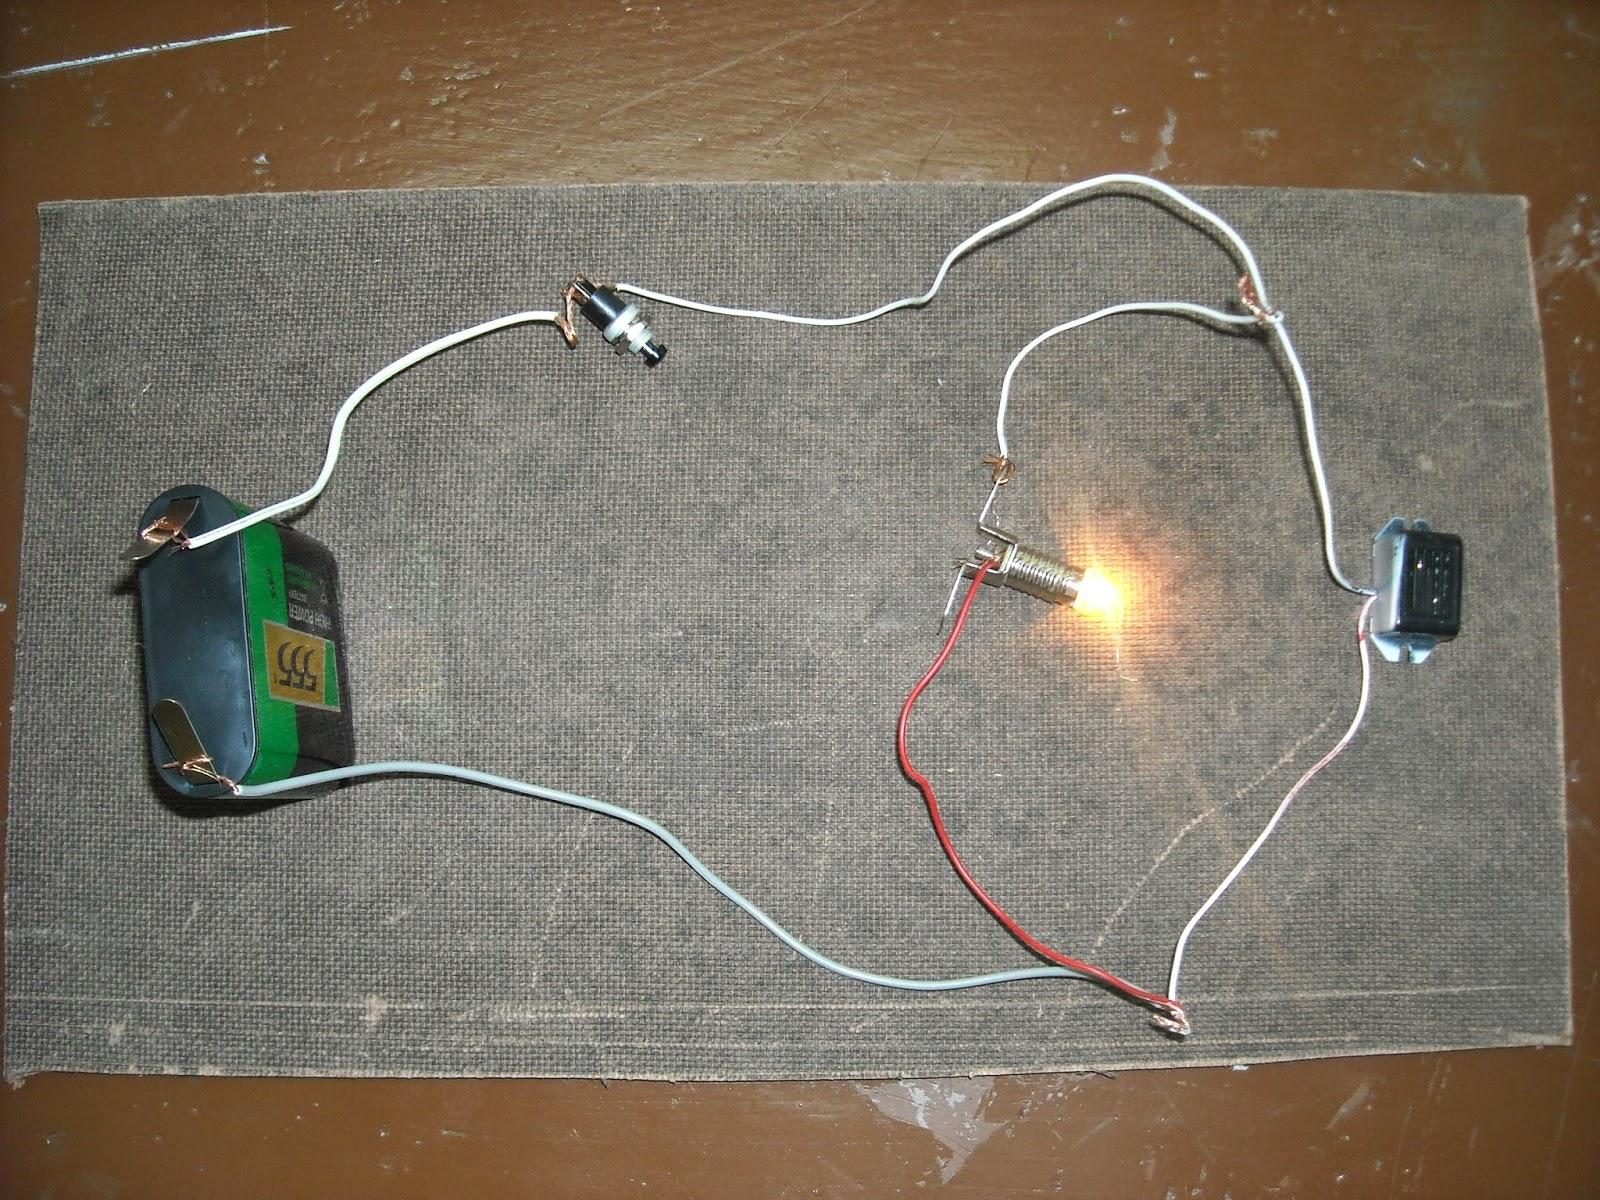 Circuito Zumbador Piezoelectrico : Circuitos en marcha cÓdigo morse con zumbador y bombilla